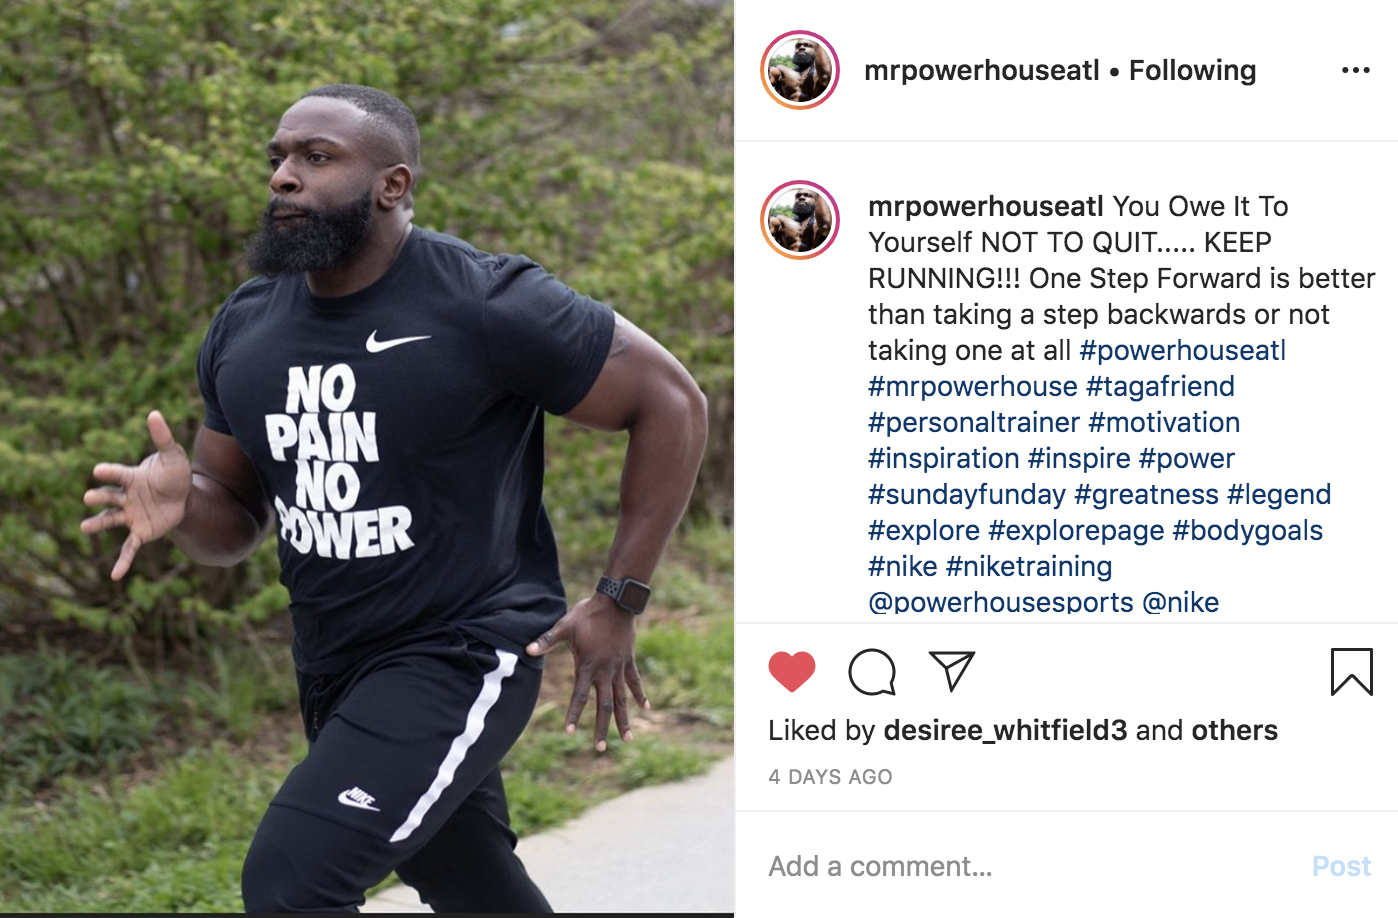 Mr. Powerhouse, @mrpowerhouseatl